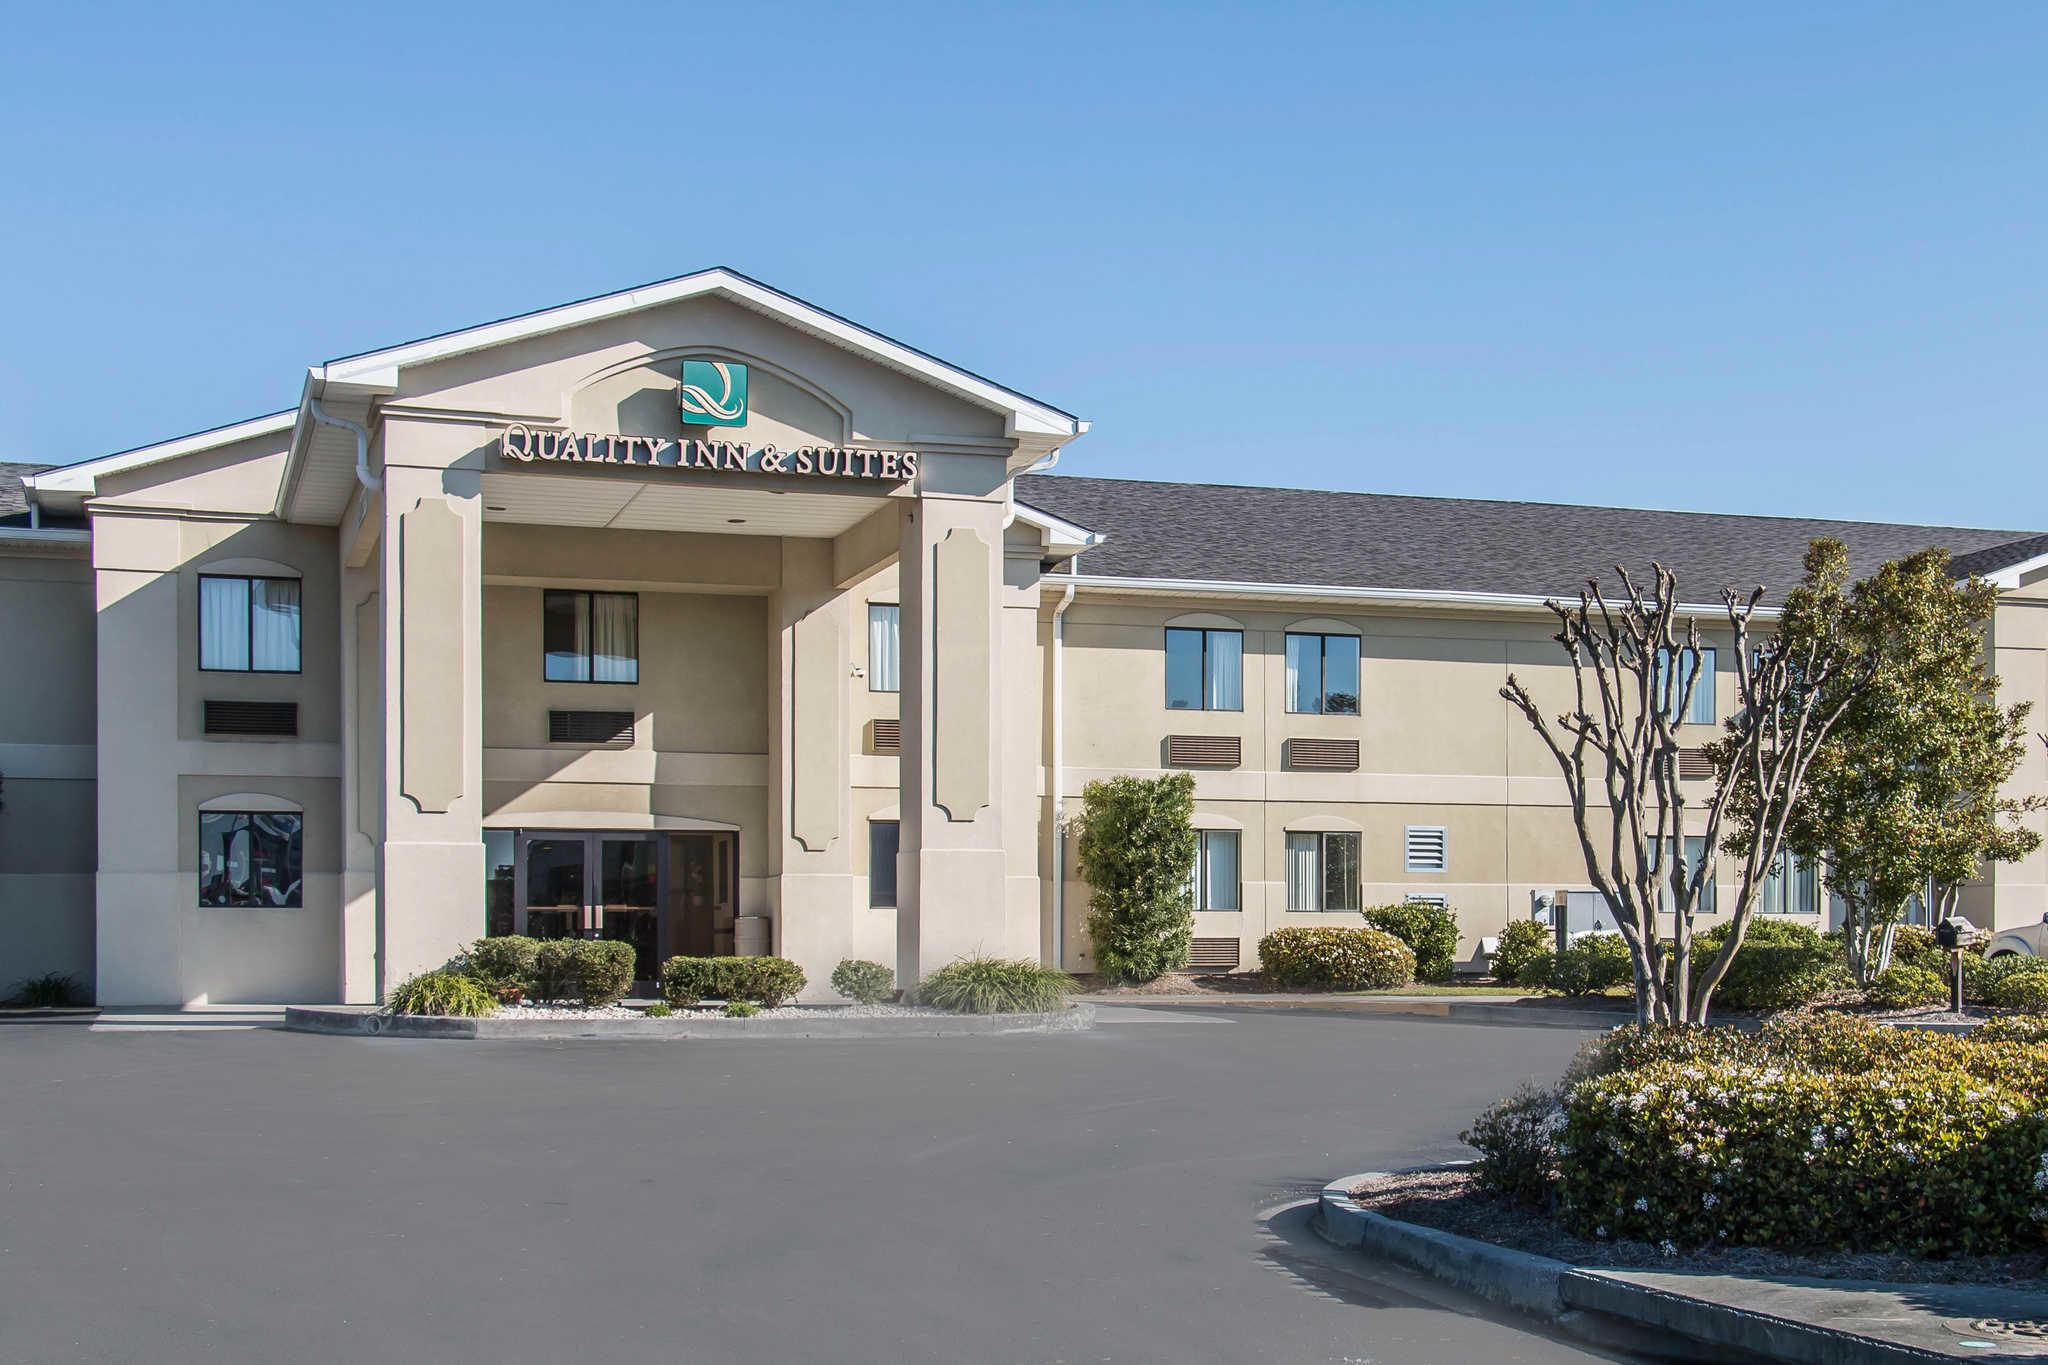 Quality Inn Amp Suites Savannah North Port Wentworth